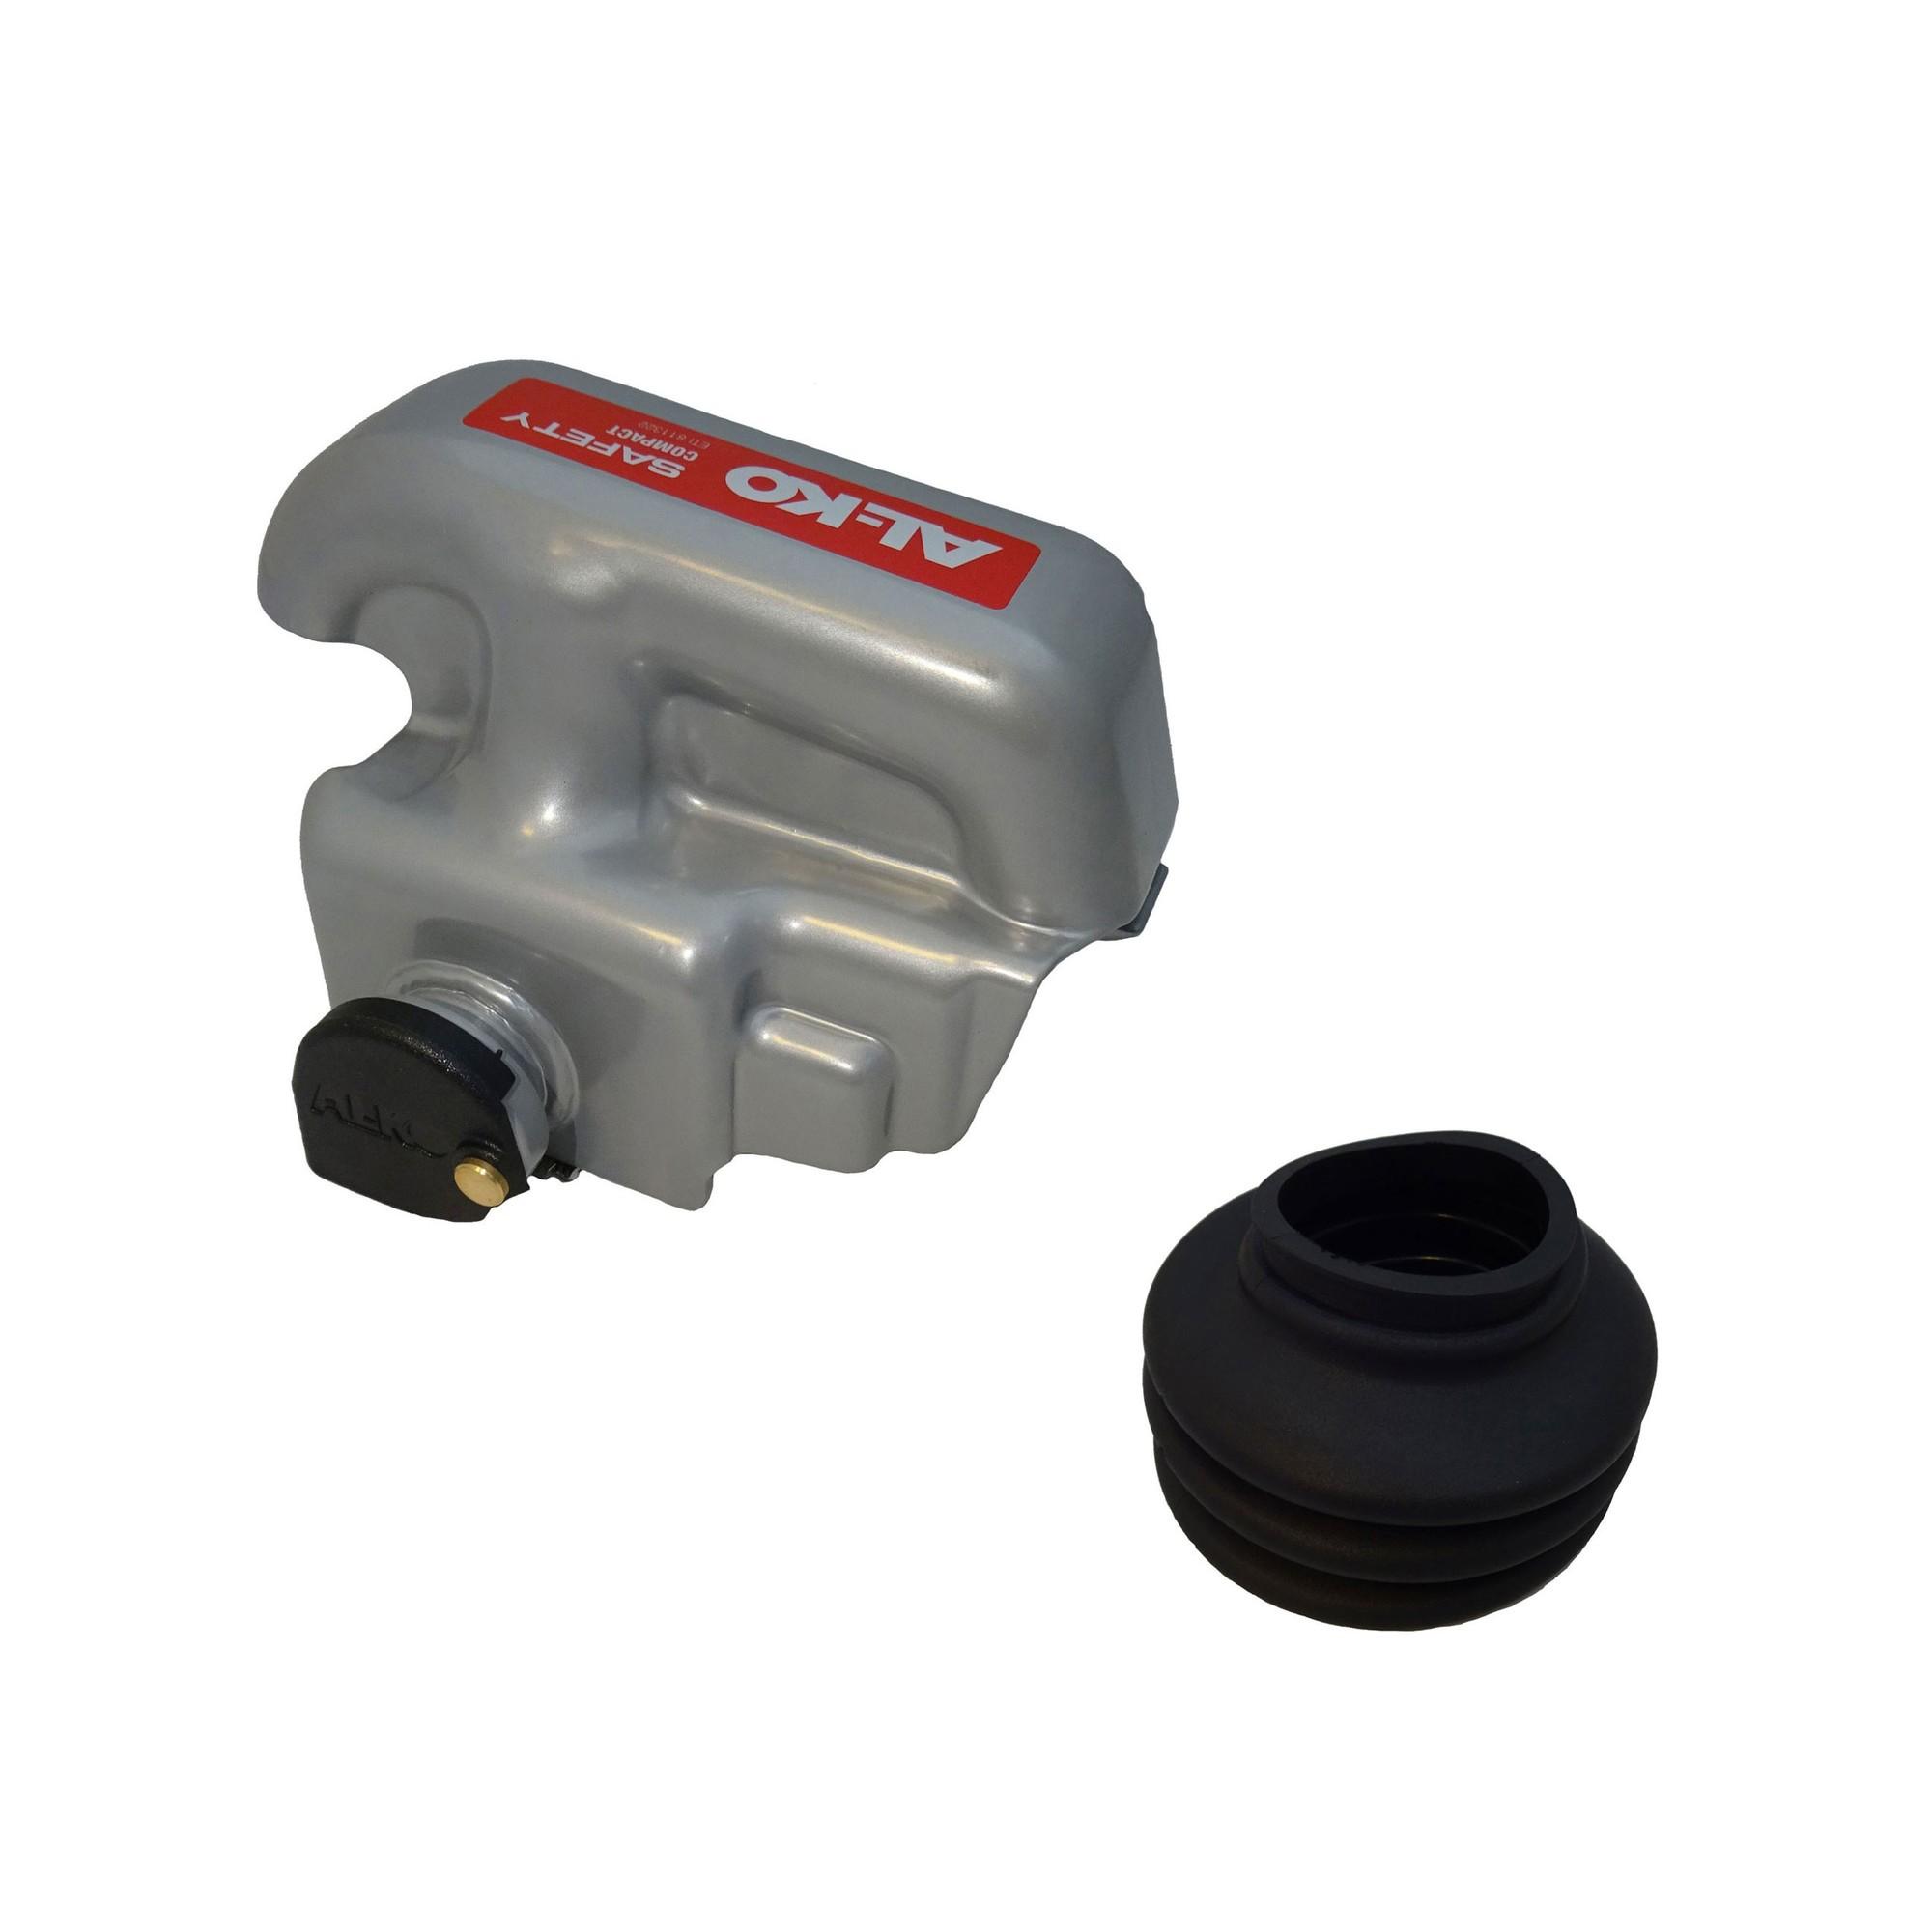 Afbeelding van Al ko Safety Compact